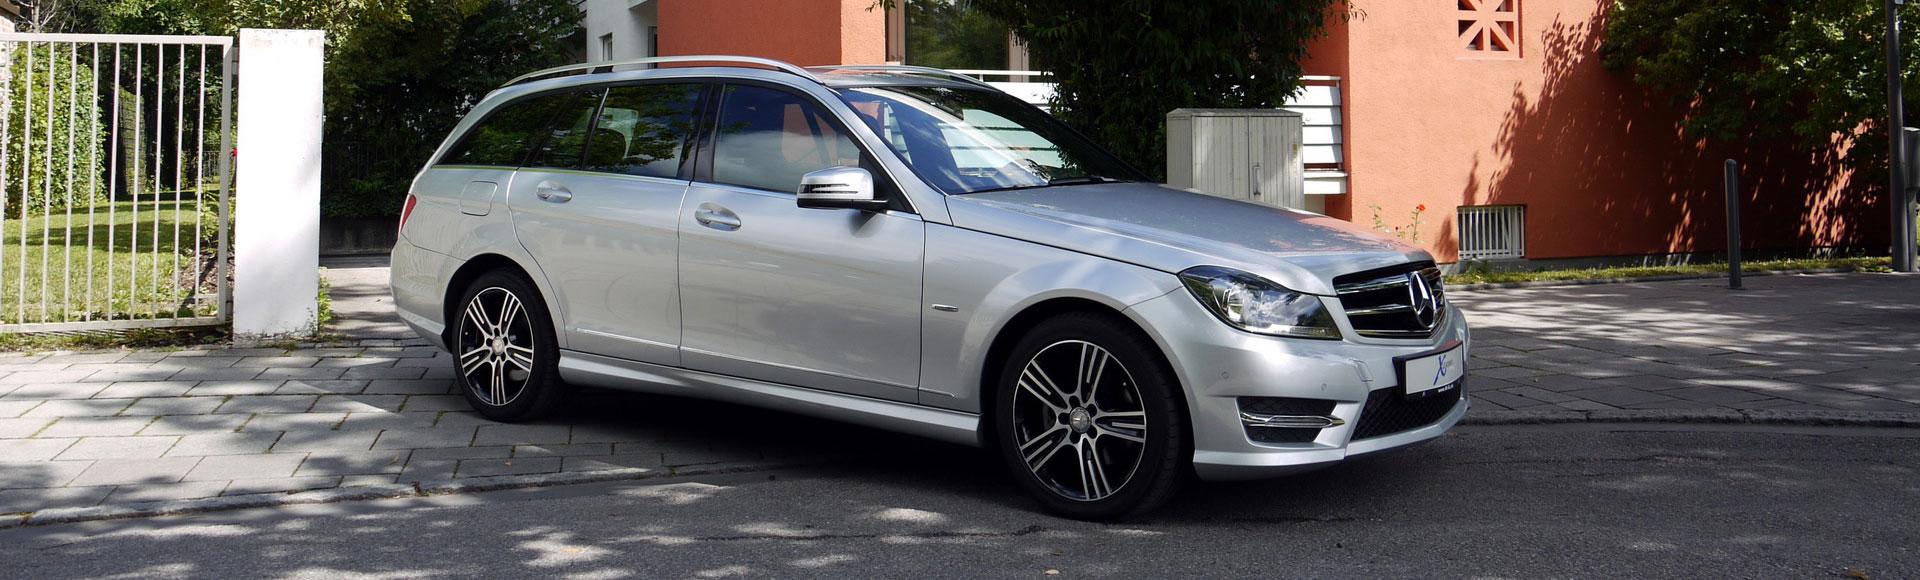 Mercedes Benz C220T 2014 Sommer 981